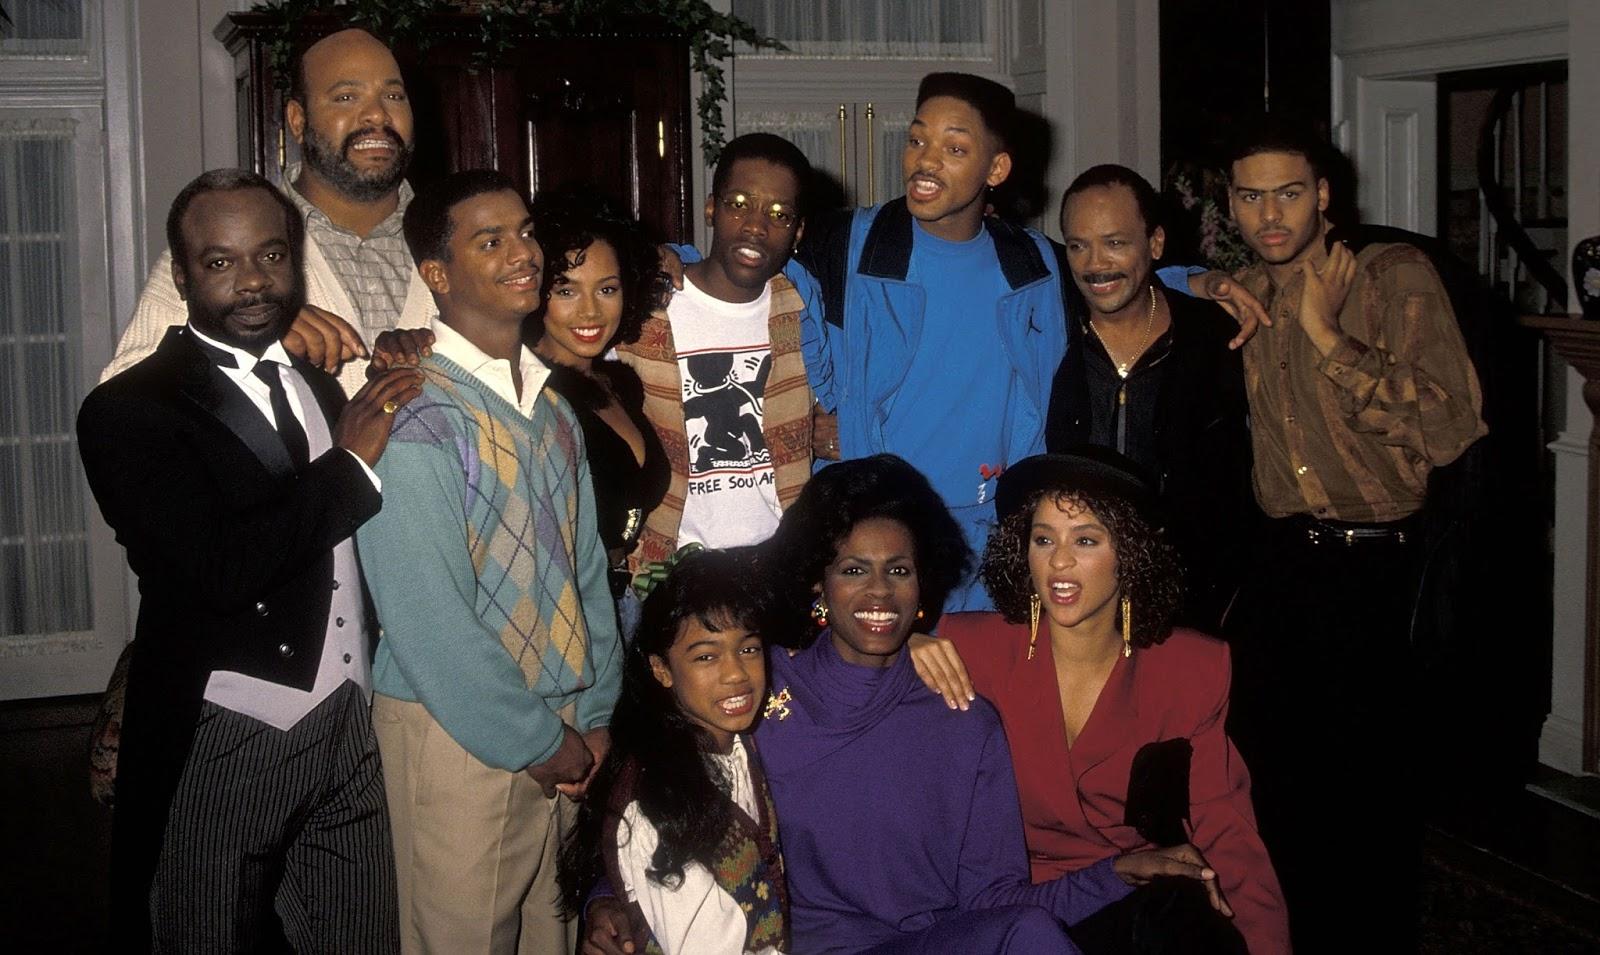 Retrospective: The Black Sitcoms of the 90's